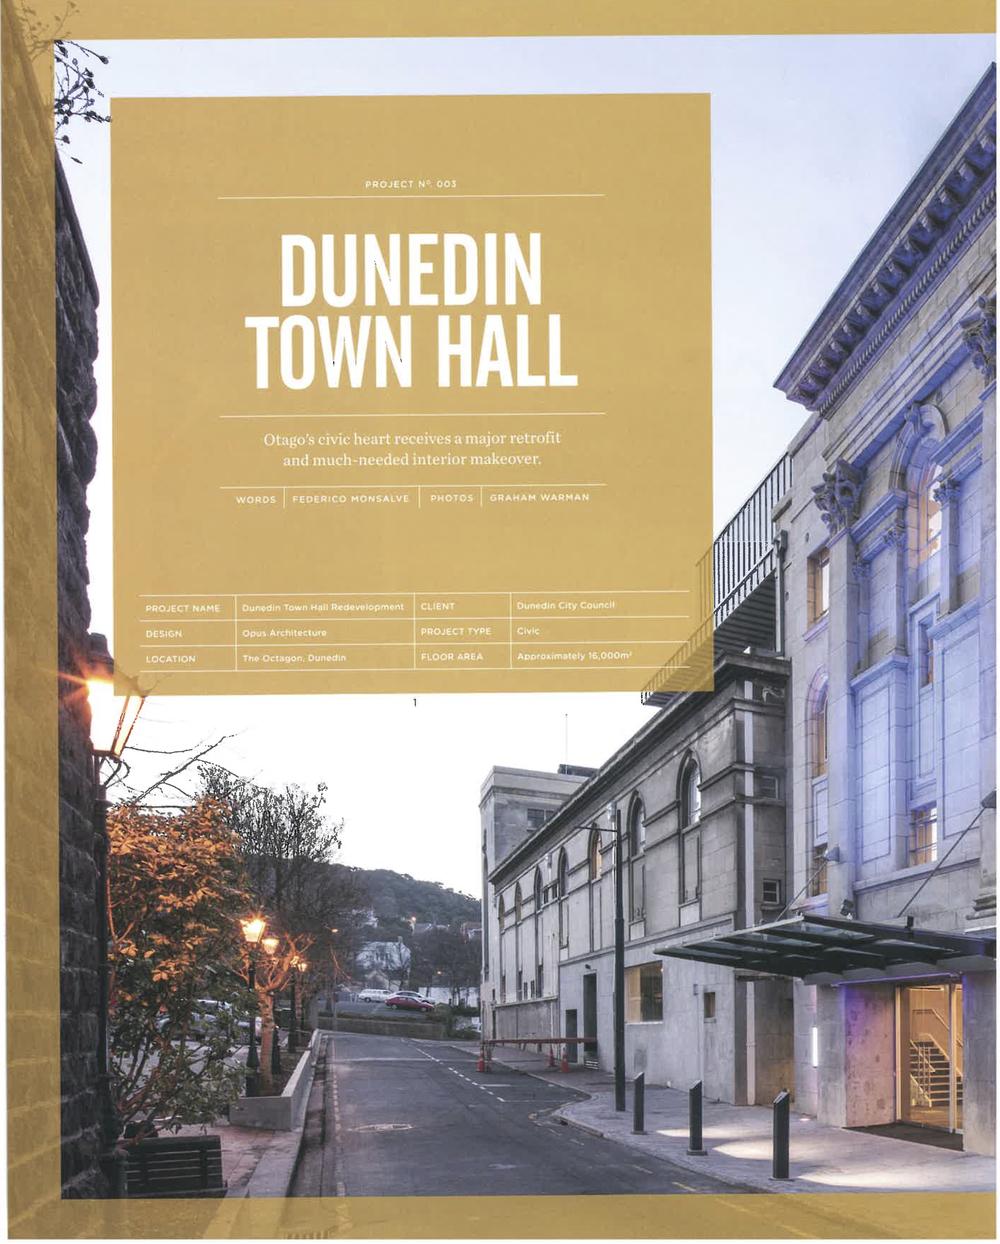 Dunedin Town Hall - Interiors Article Dec - Feb 2014 -2015_1.jpg